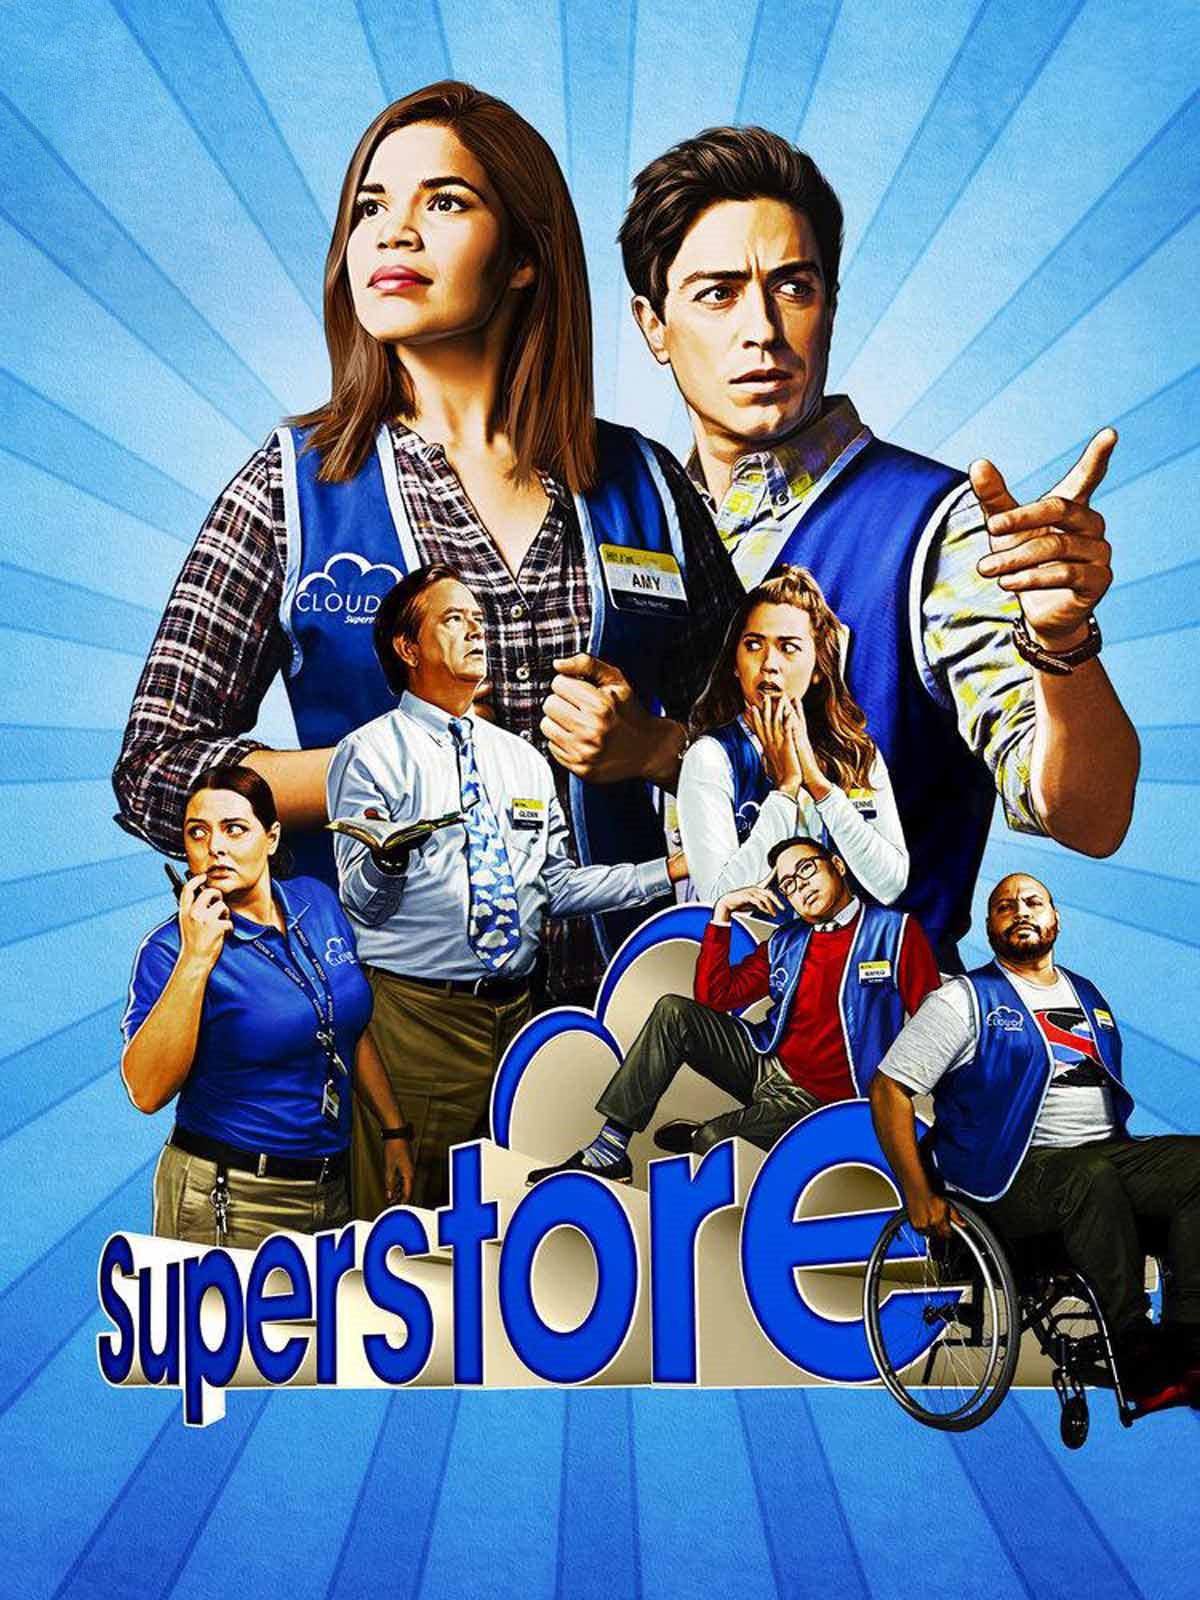 36 - Superstore